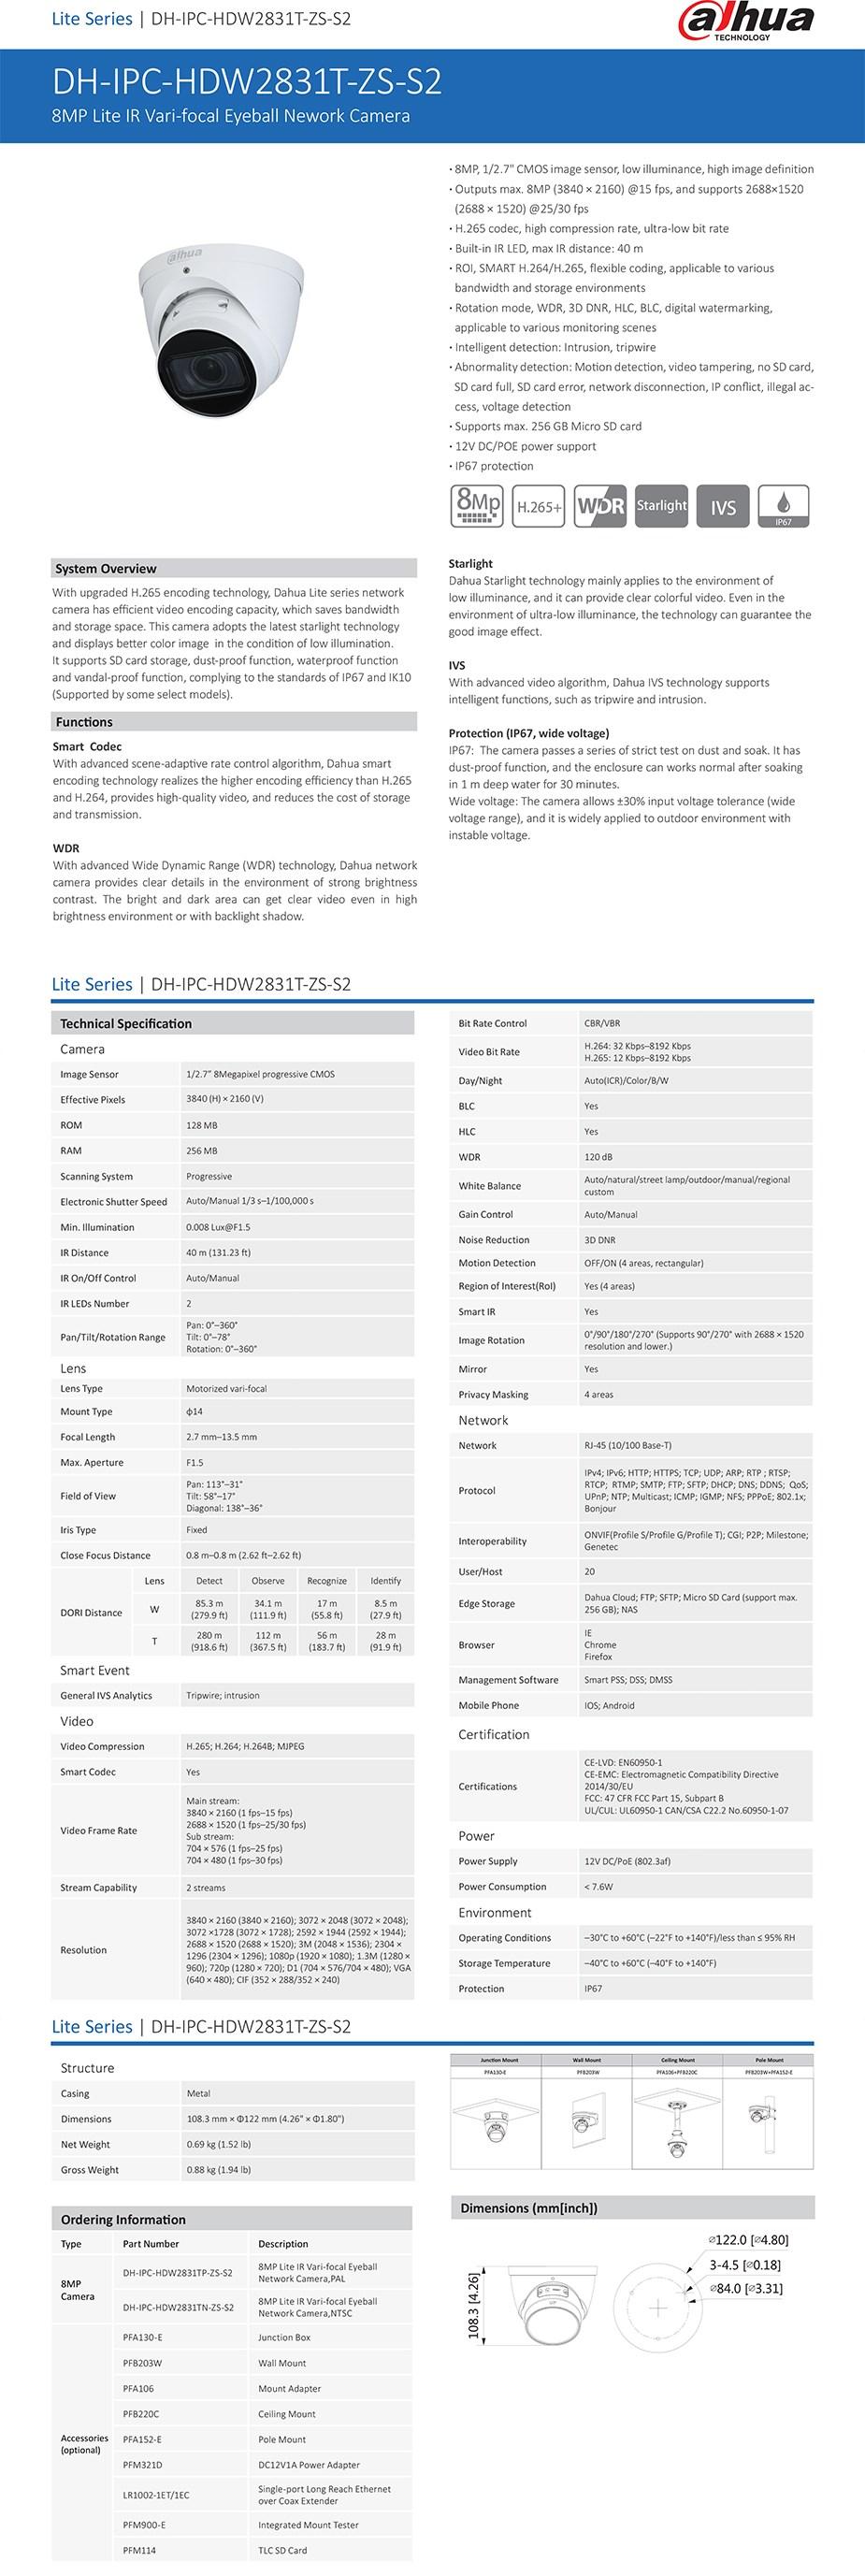 Dahua DH-IPC-HDW2831TP-ZS-27135-S2 4K 8MP Vari-Focal EyeBall Network Camera - Overview 1